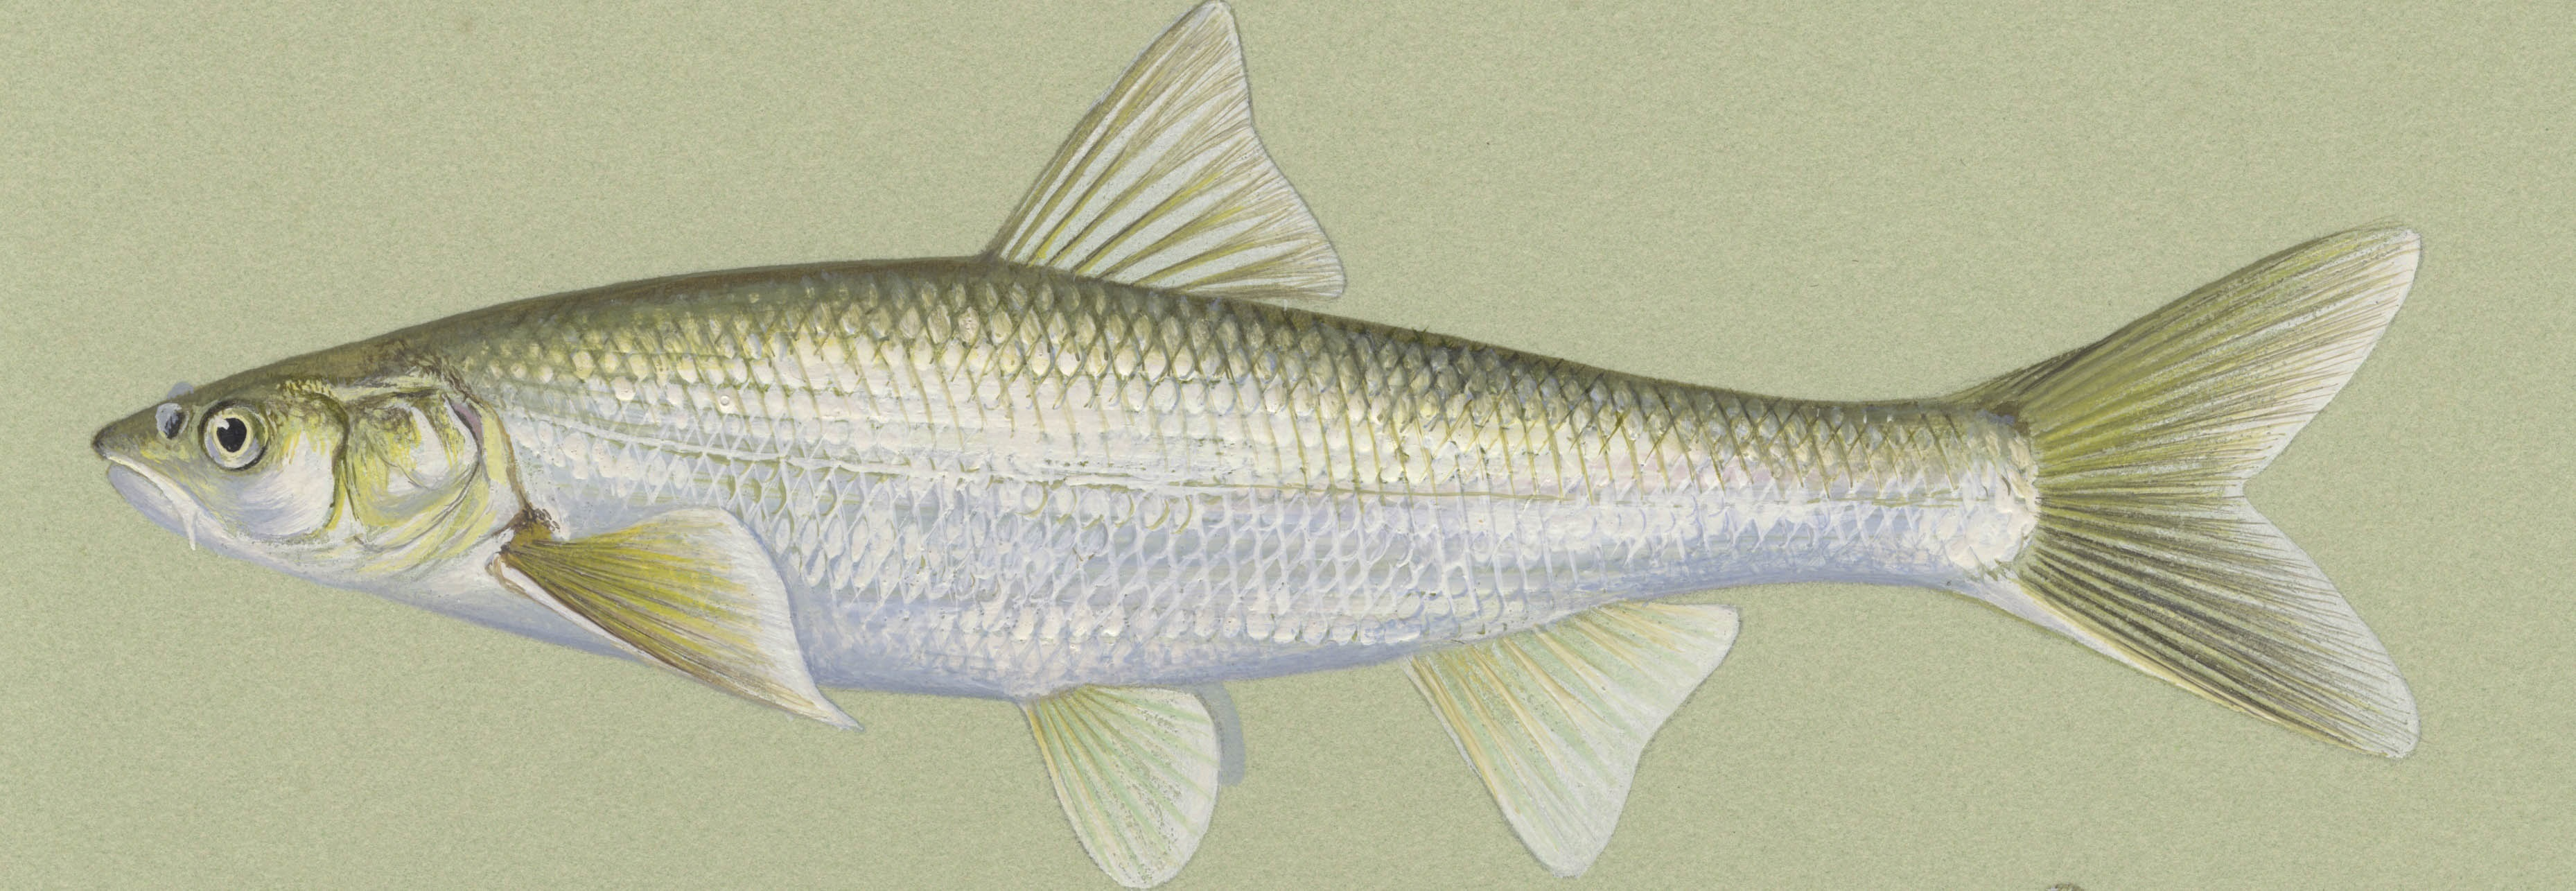 Chub Fish | Details Flathead Chub